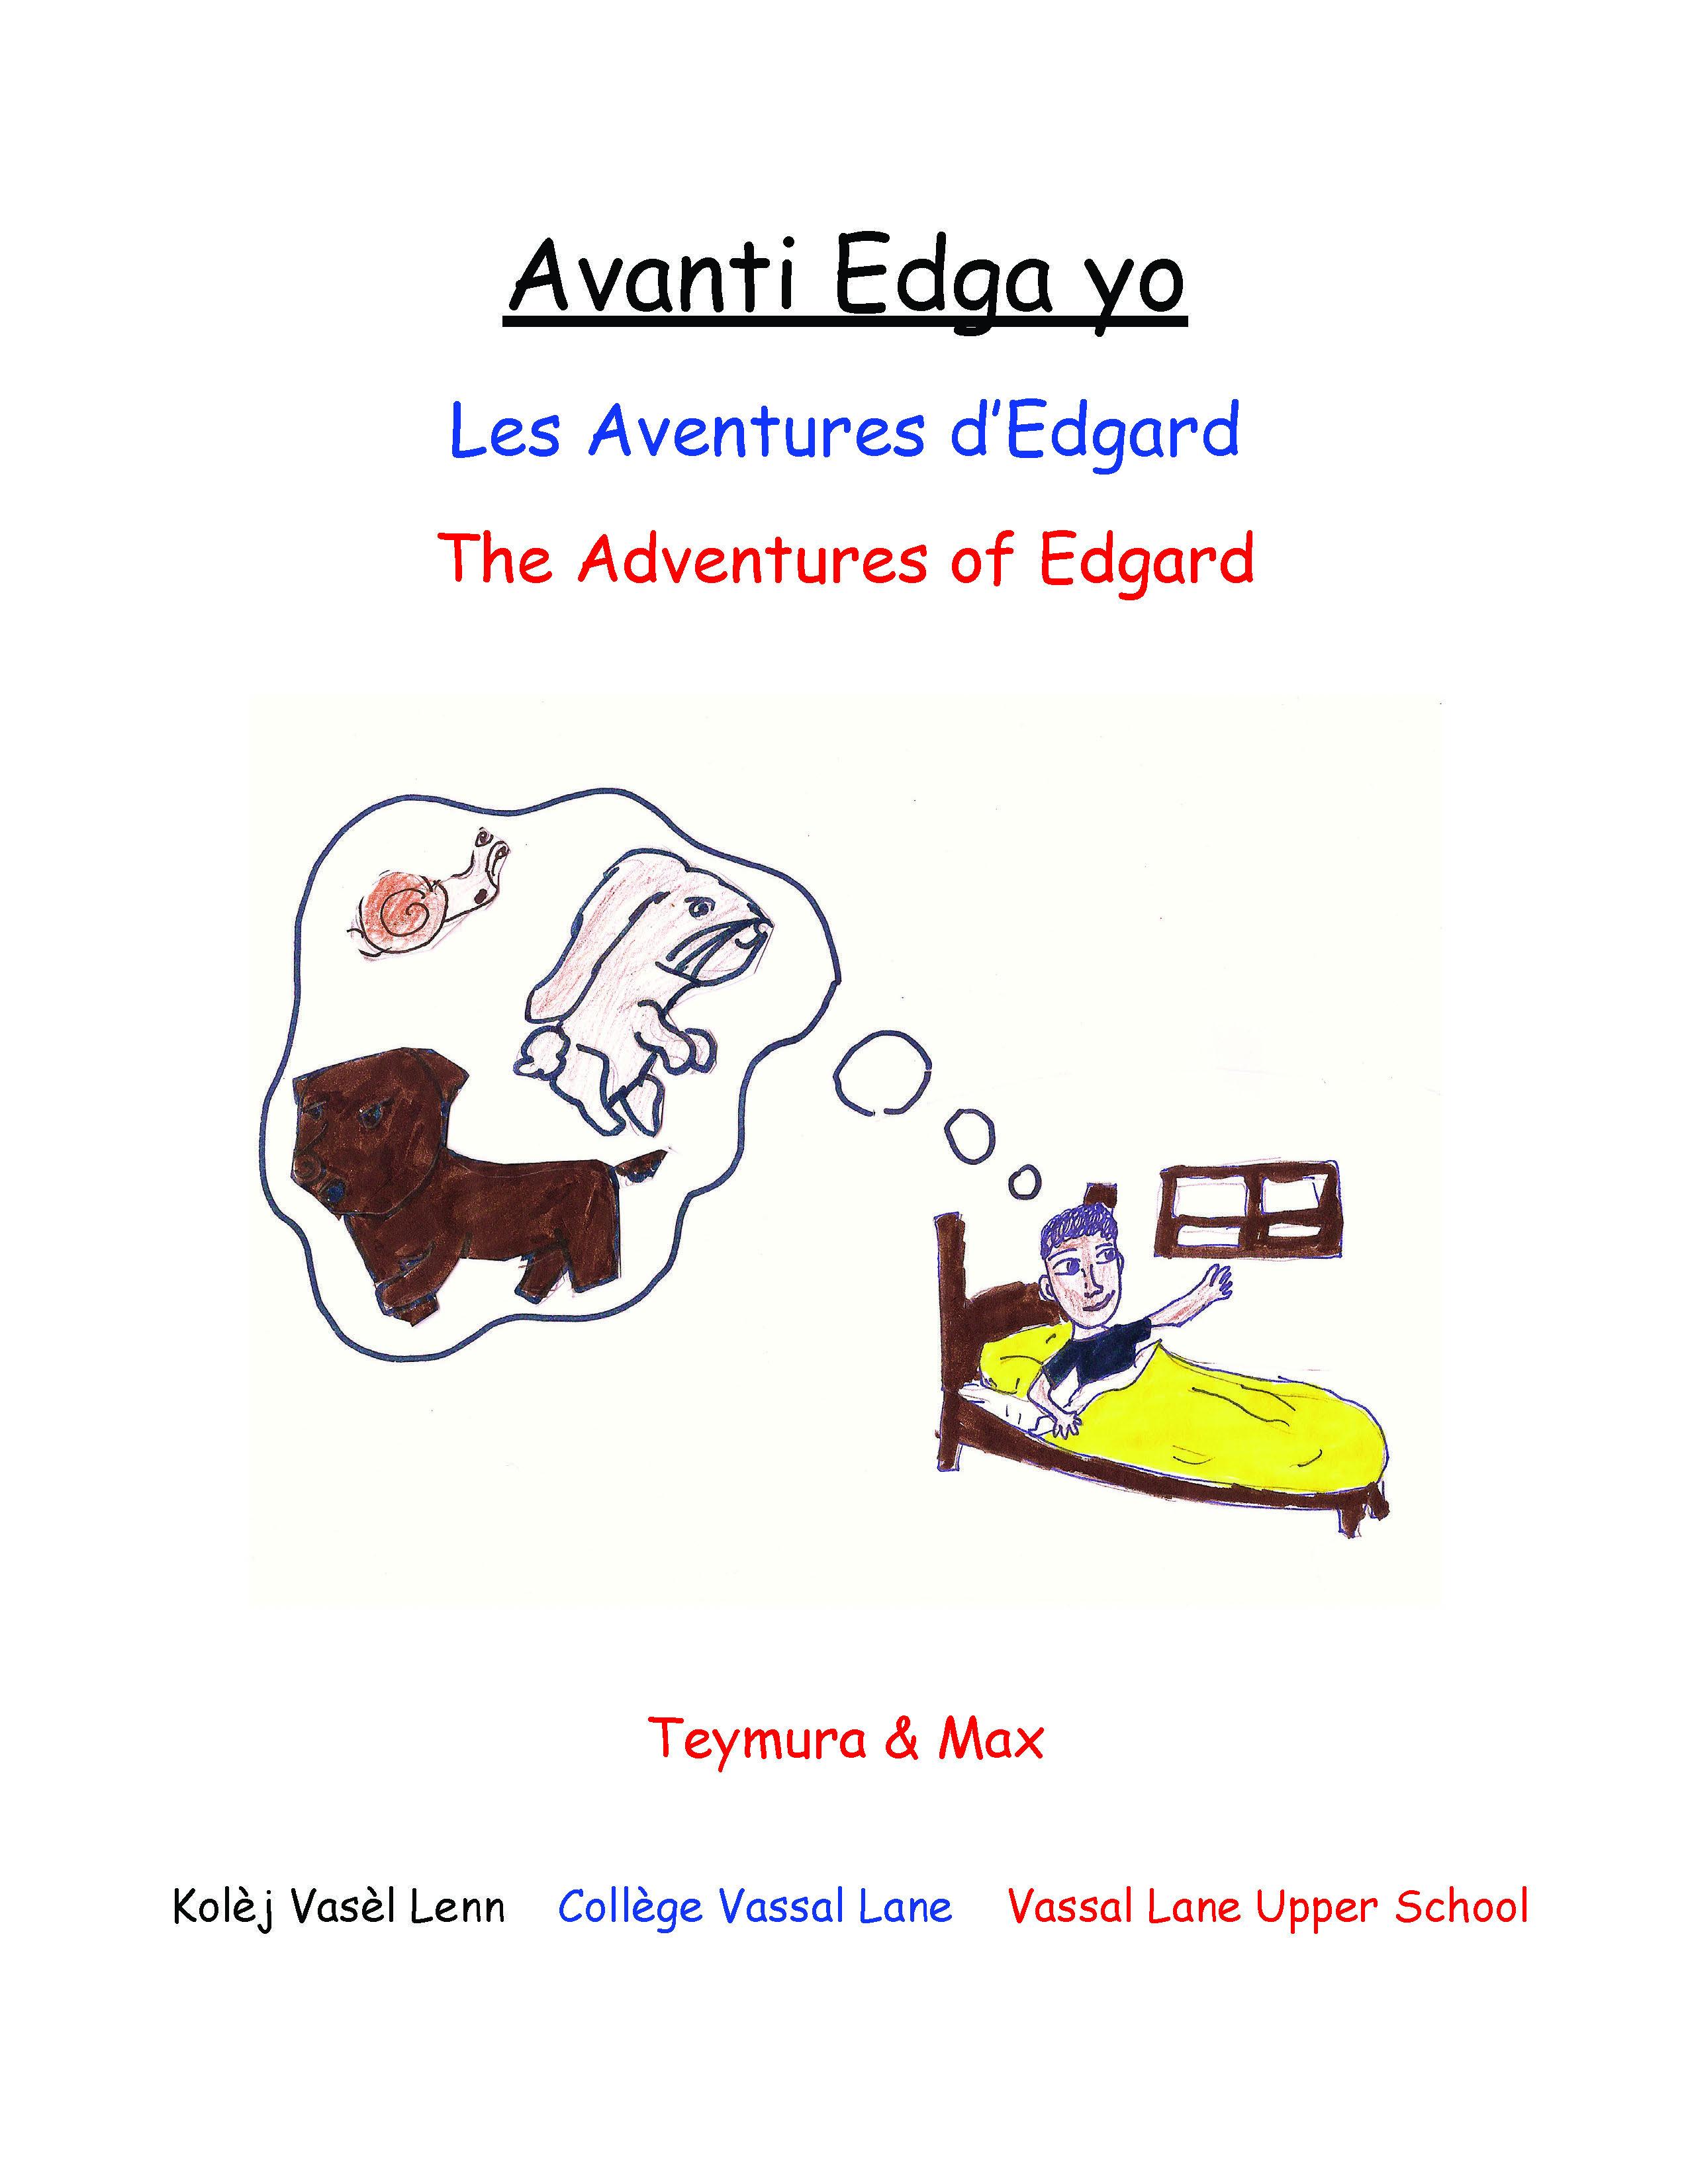 Avanti Edga yo / The Adventures of Edgard